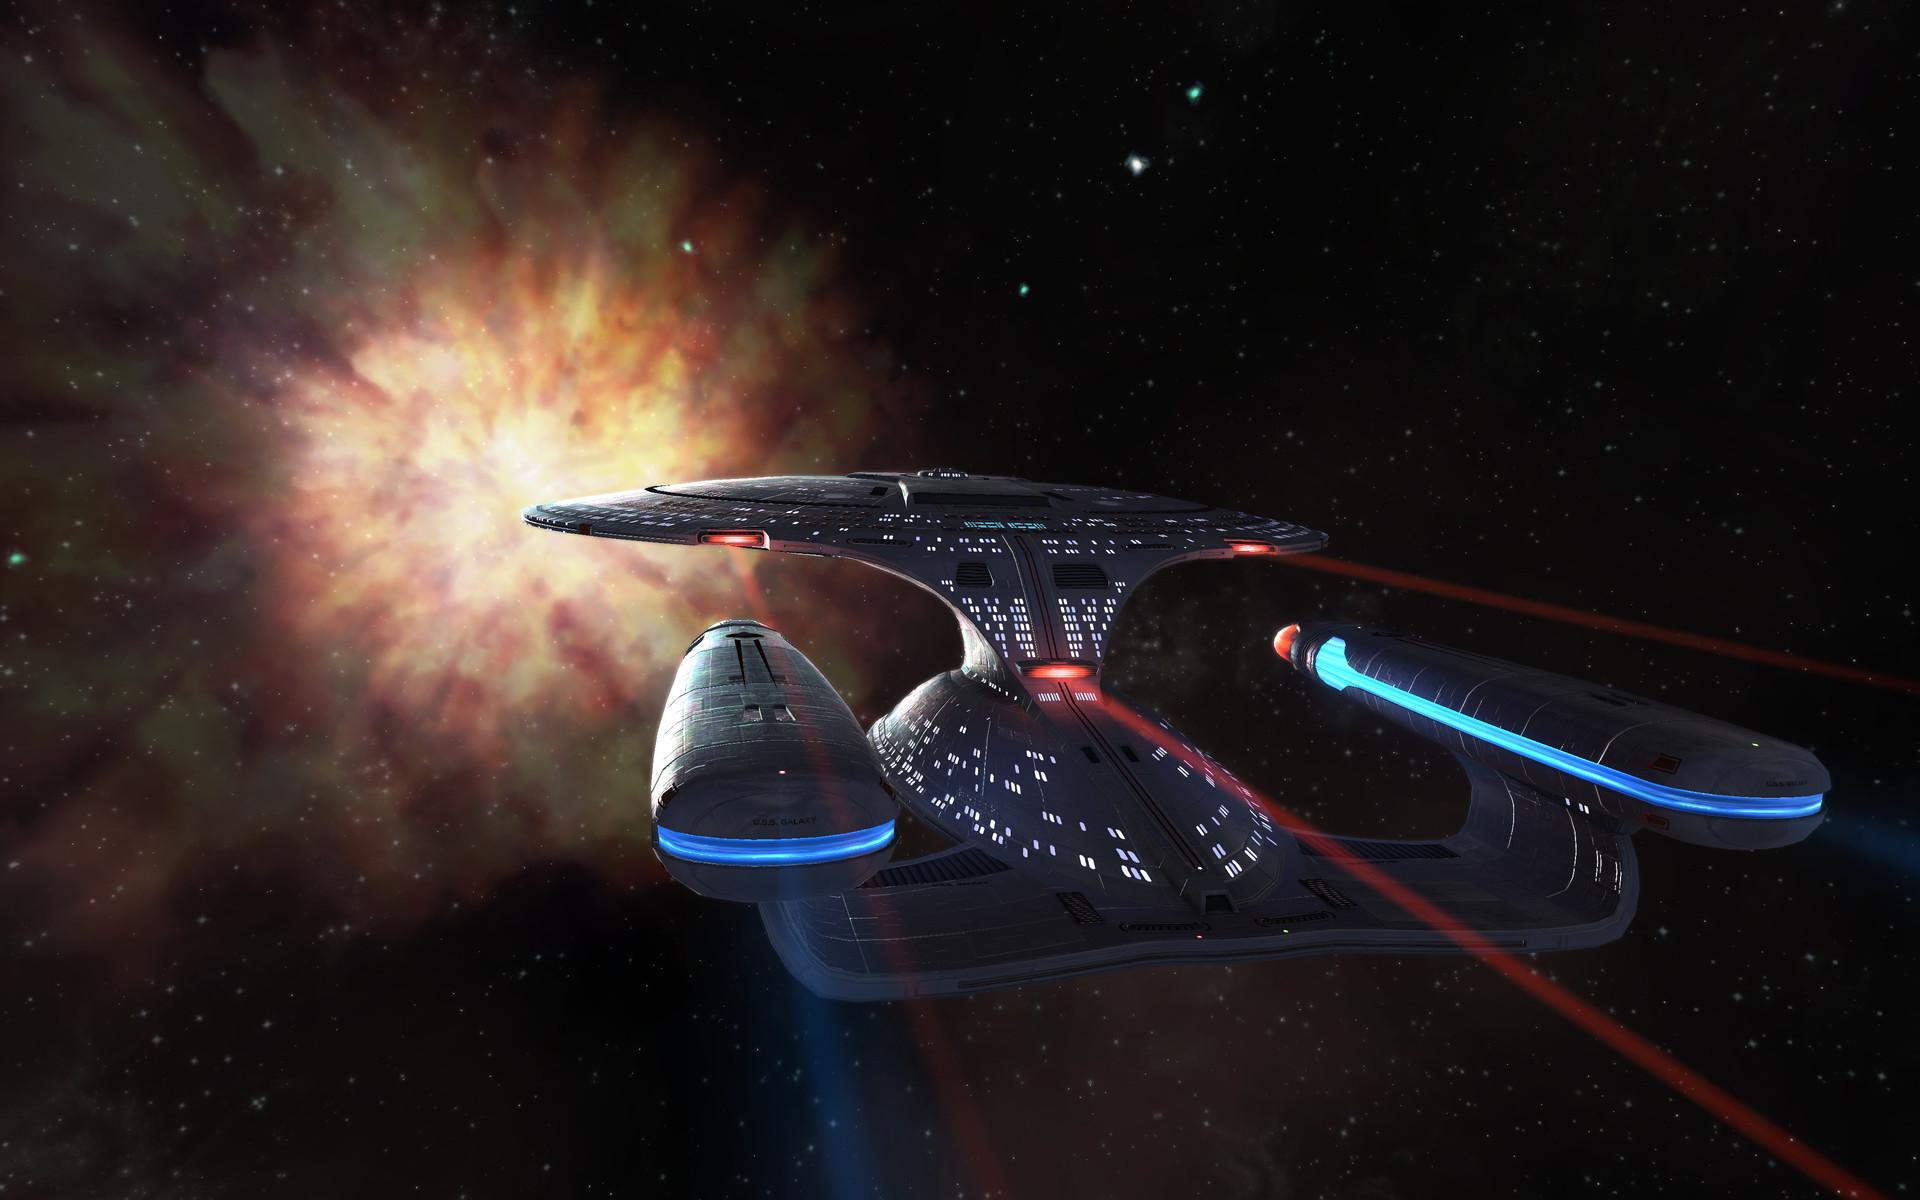 Thomas marrone screenshot galaxy 03